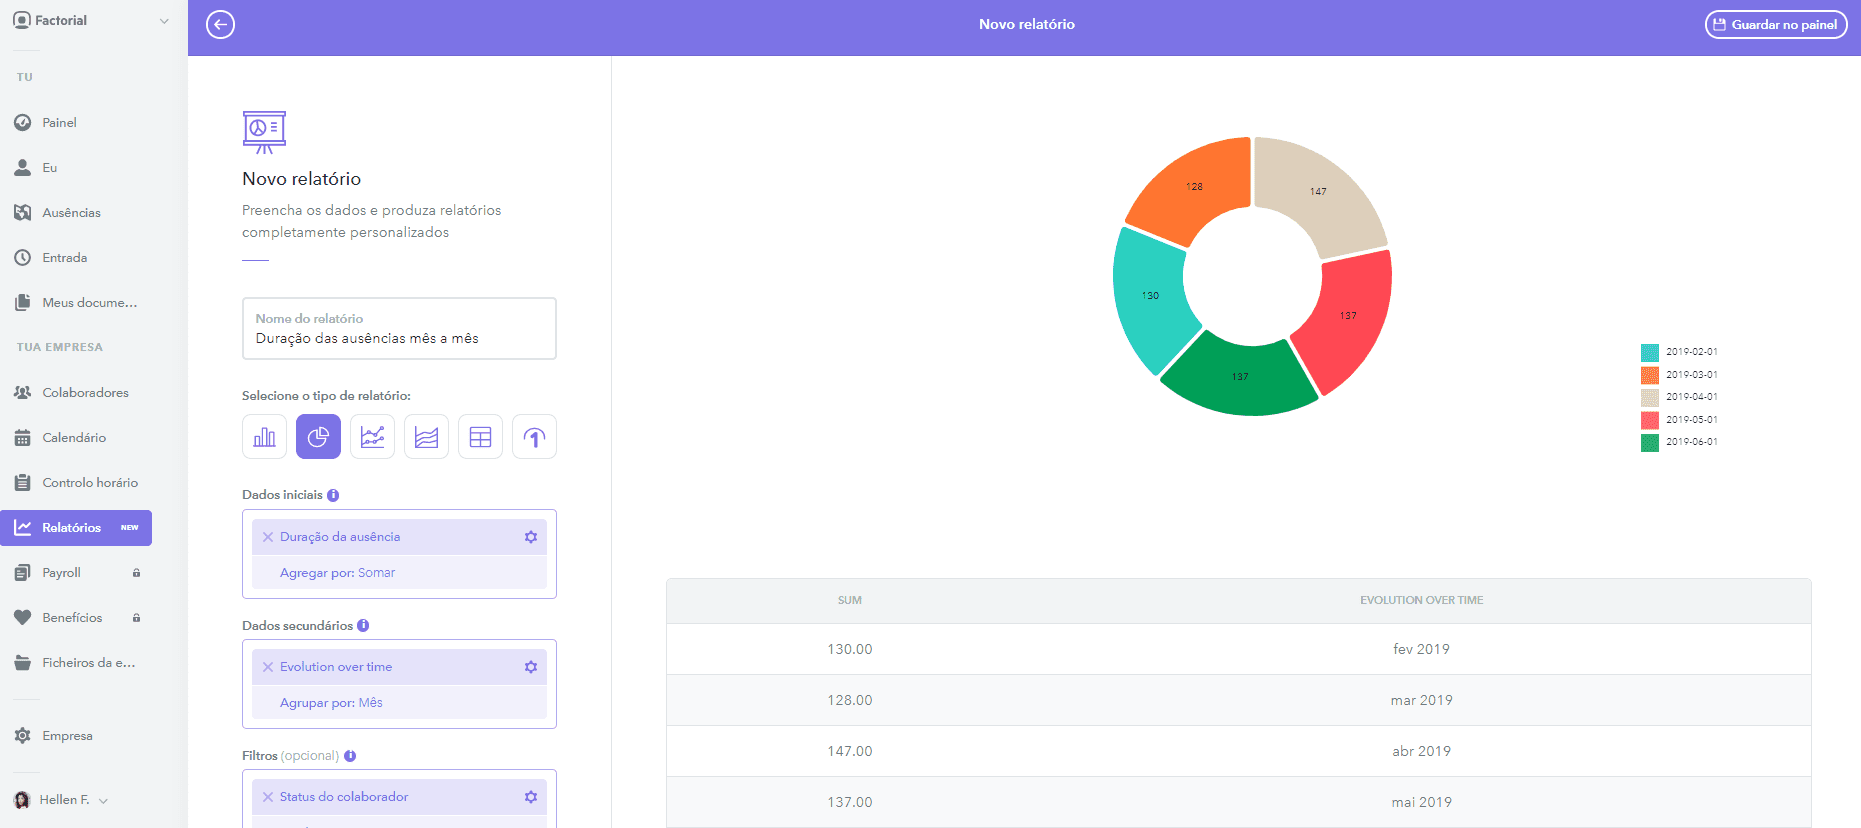 relatorios indicadores do software de RH